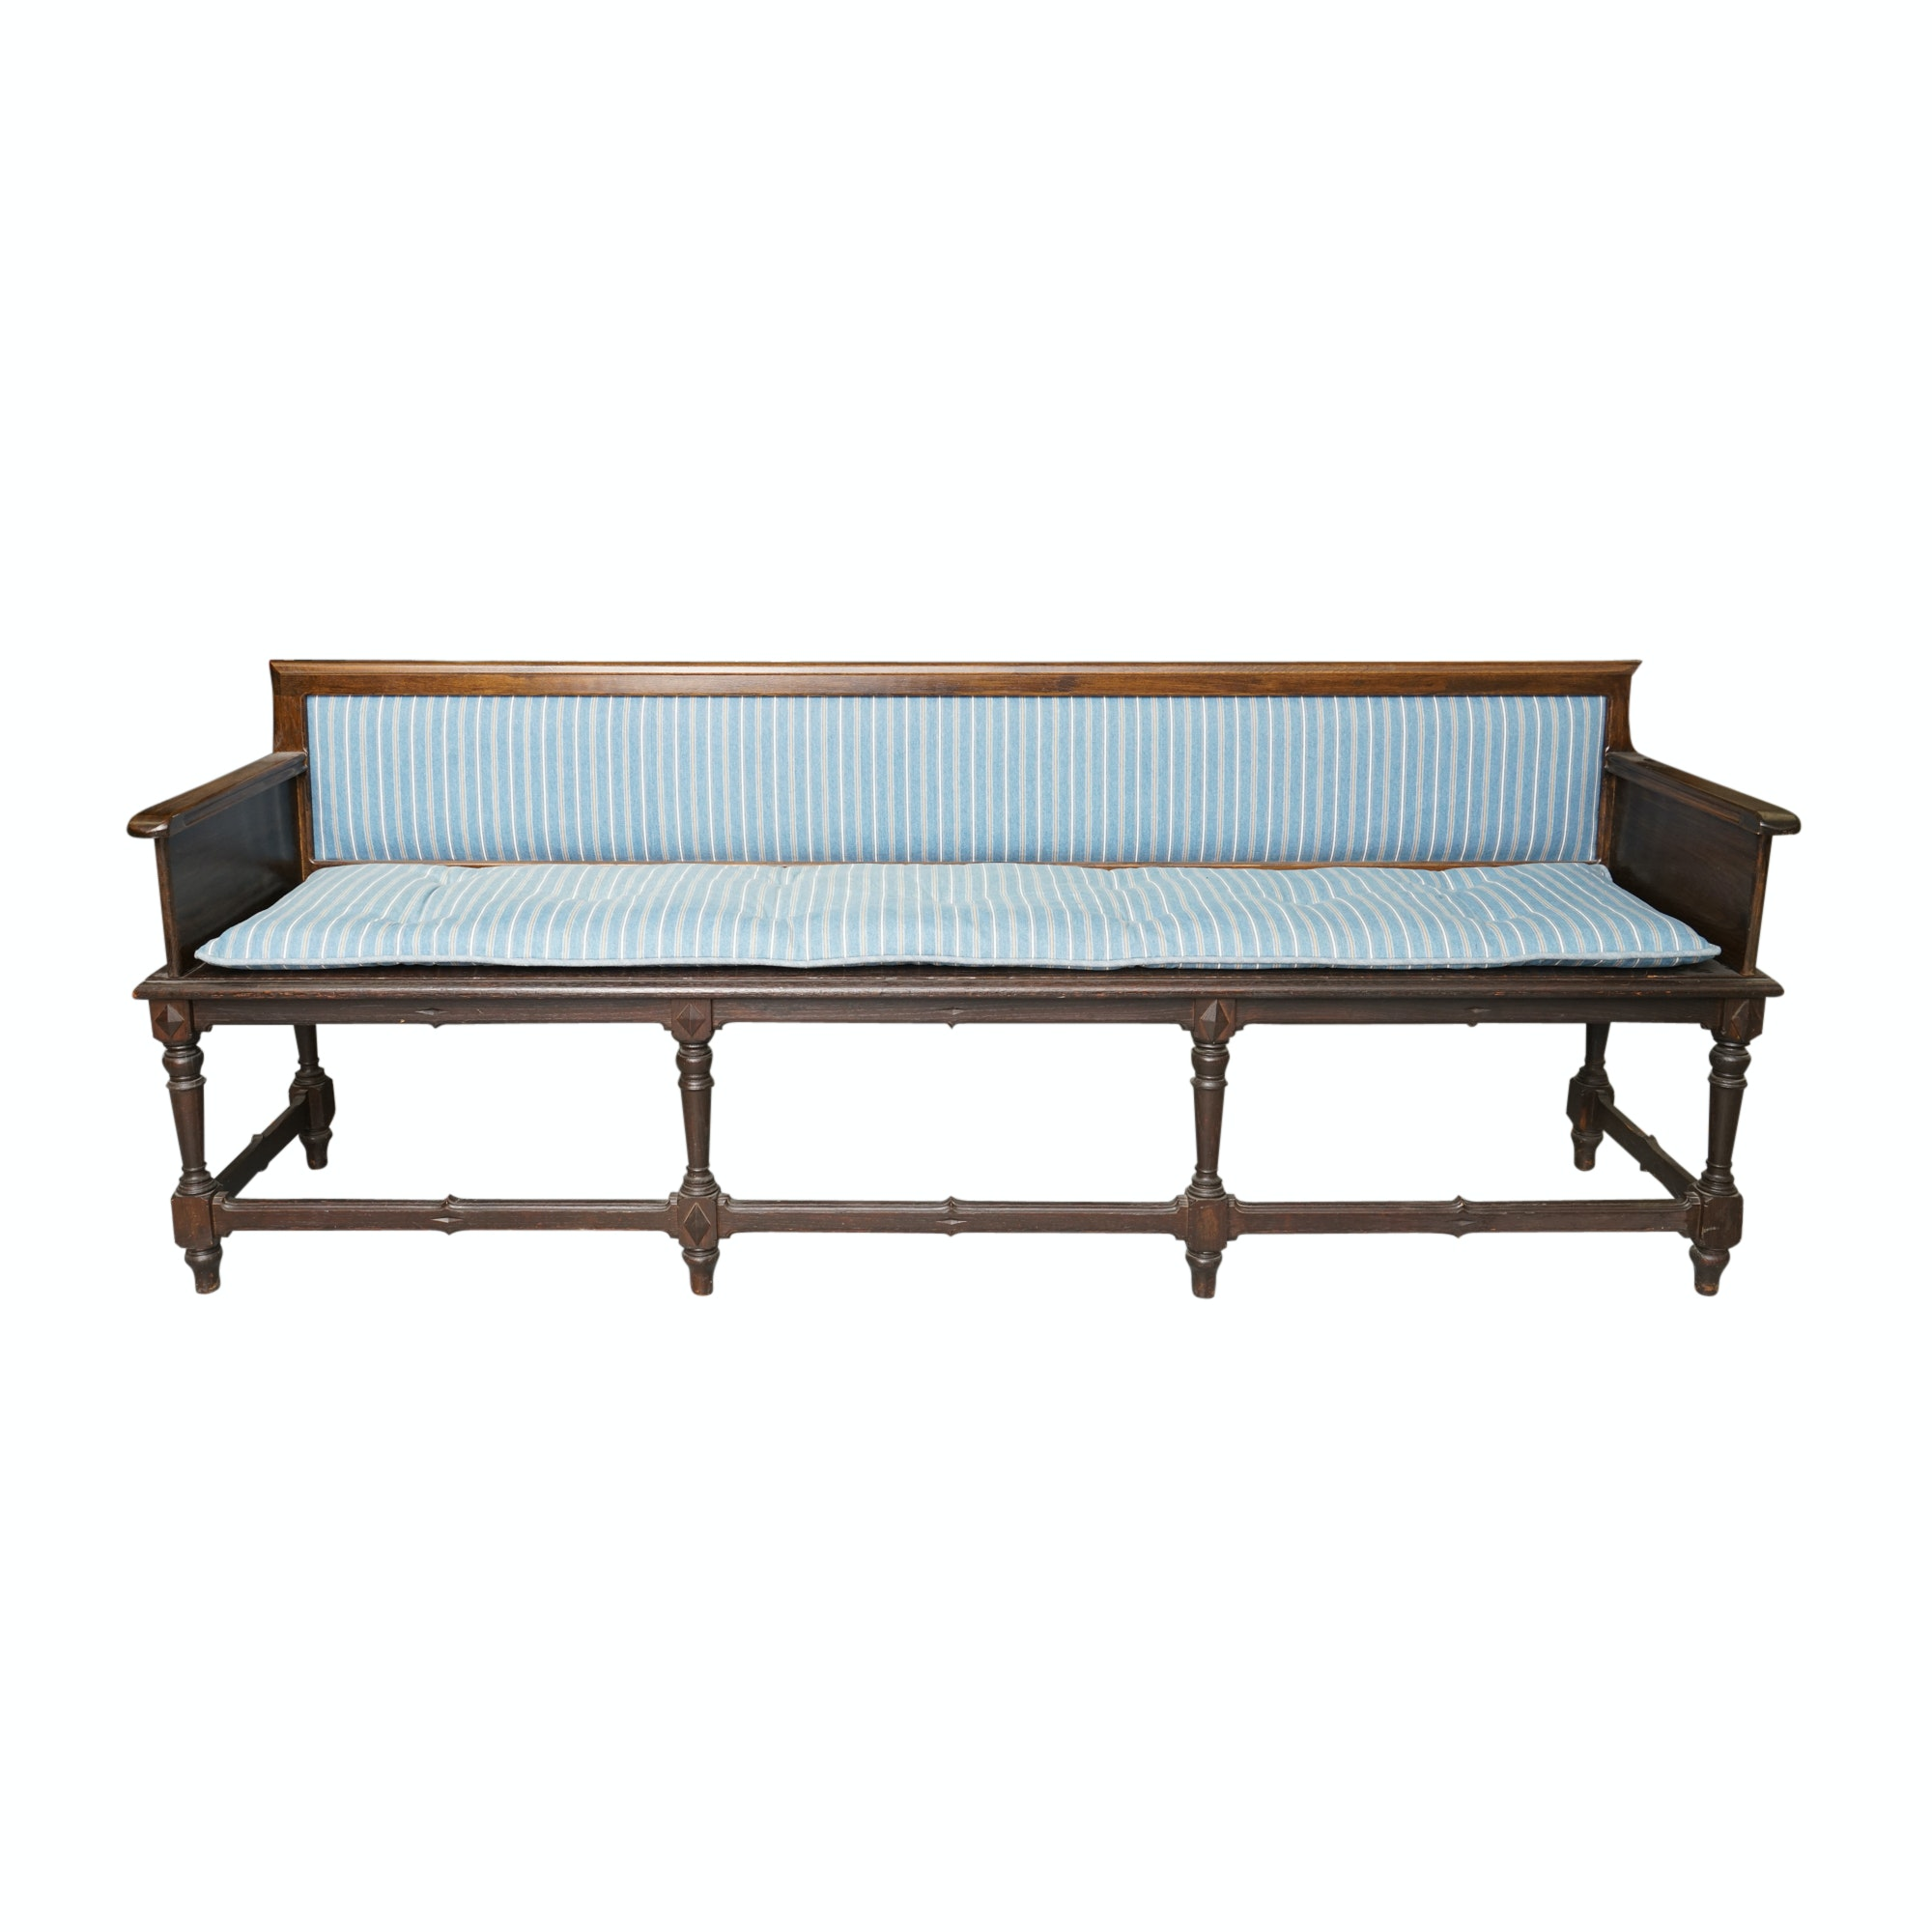 Vintage English Revival Style Oak Bench